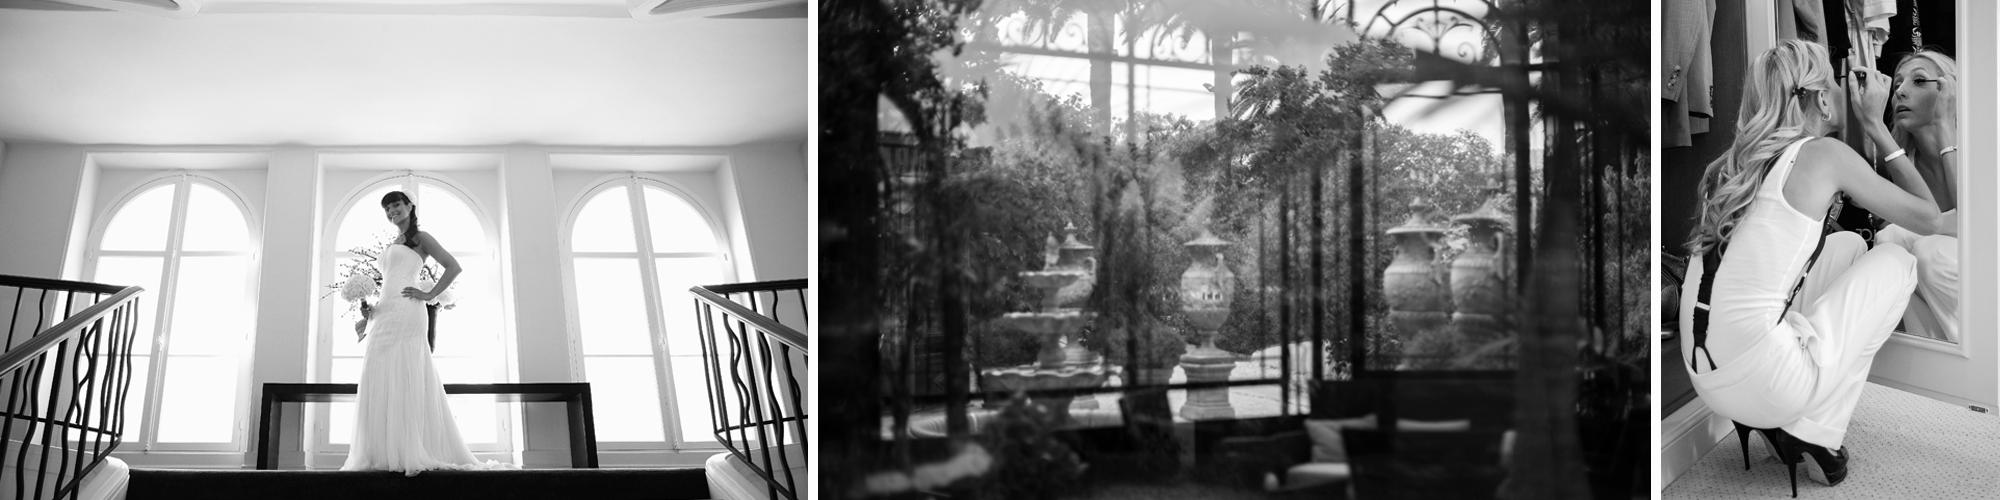 studio-colas-photographe-mariage-preparation-aix-provence